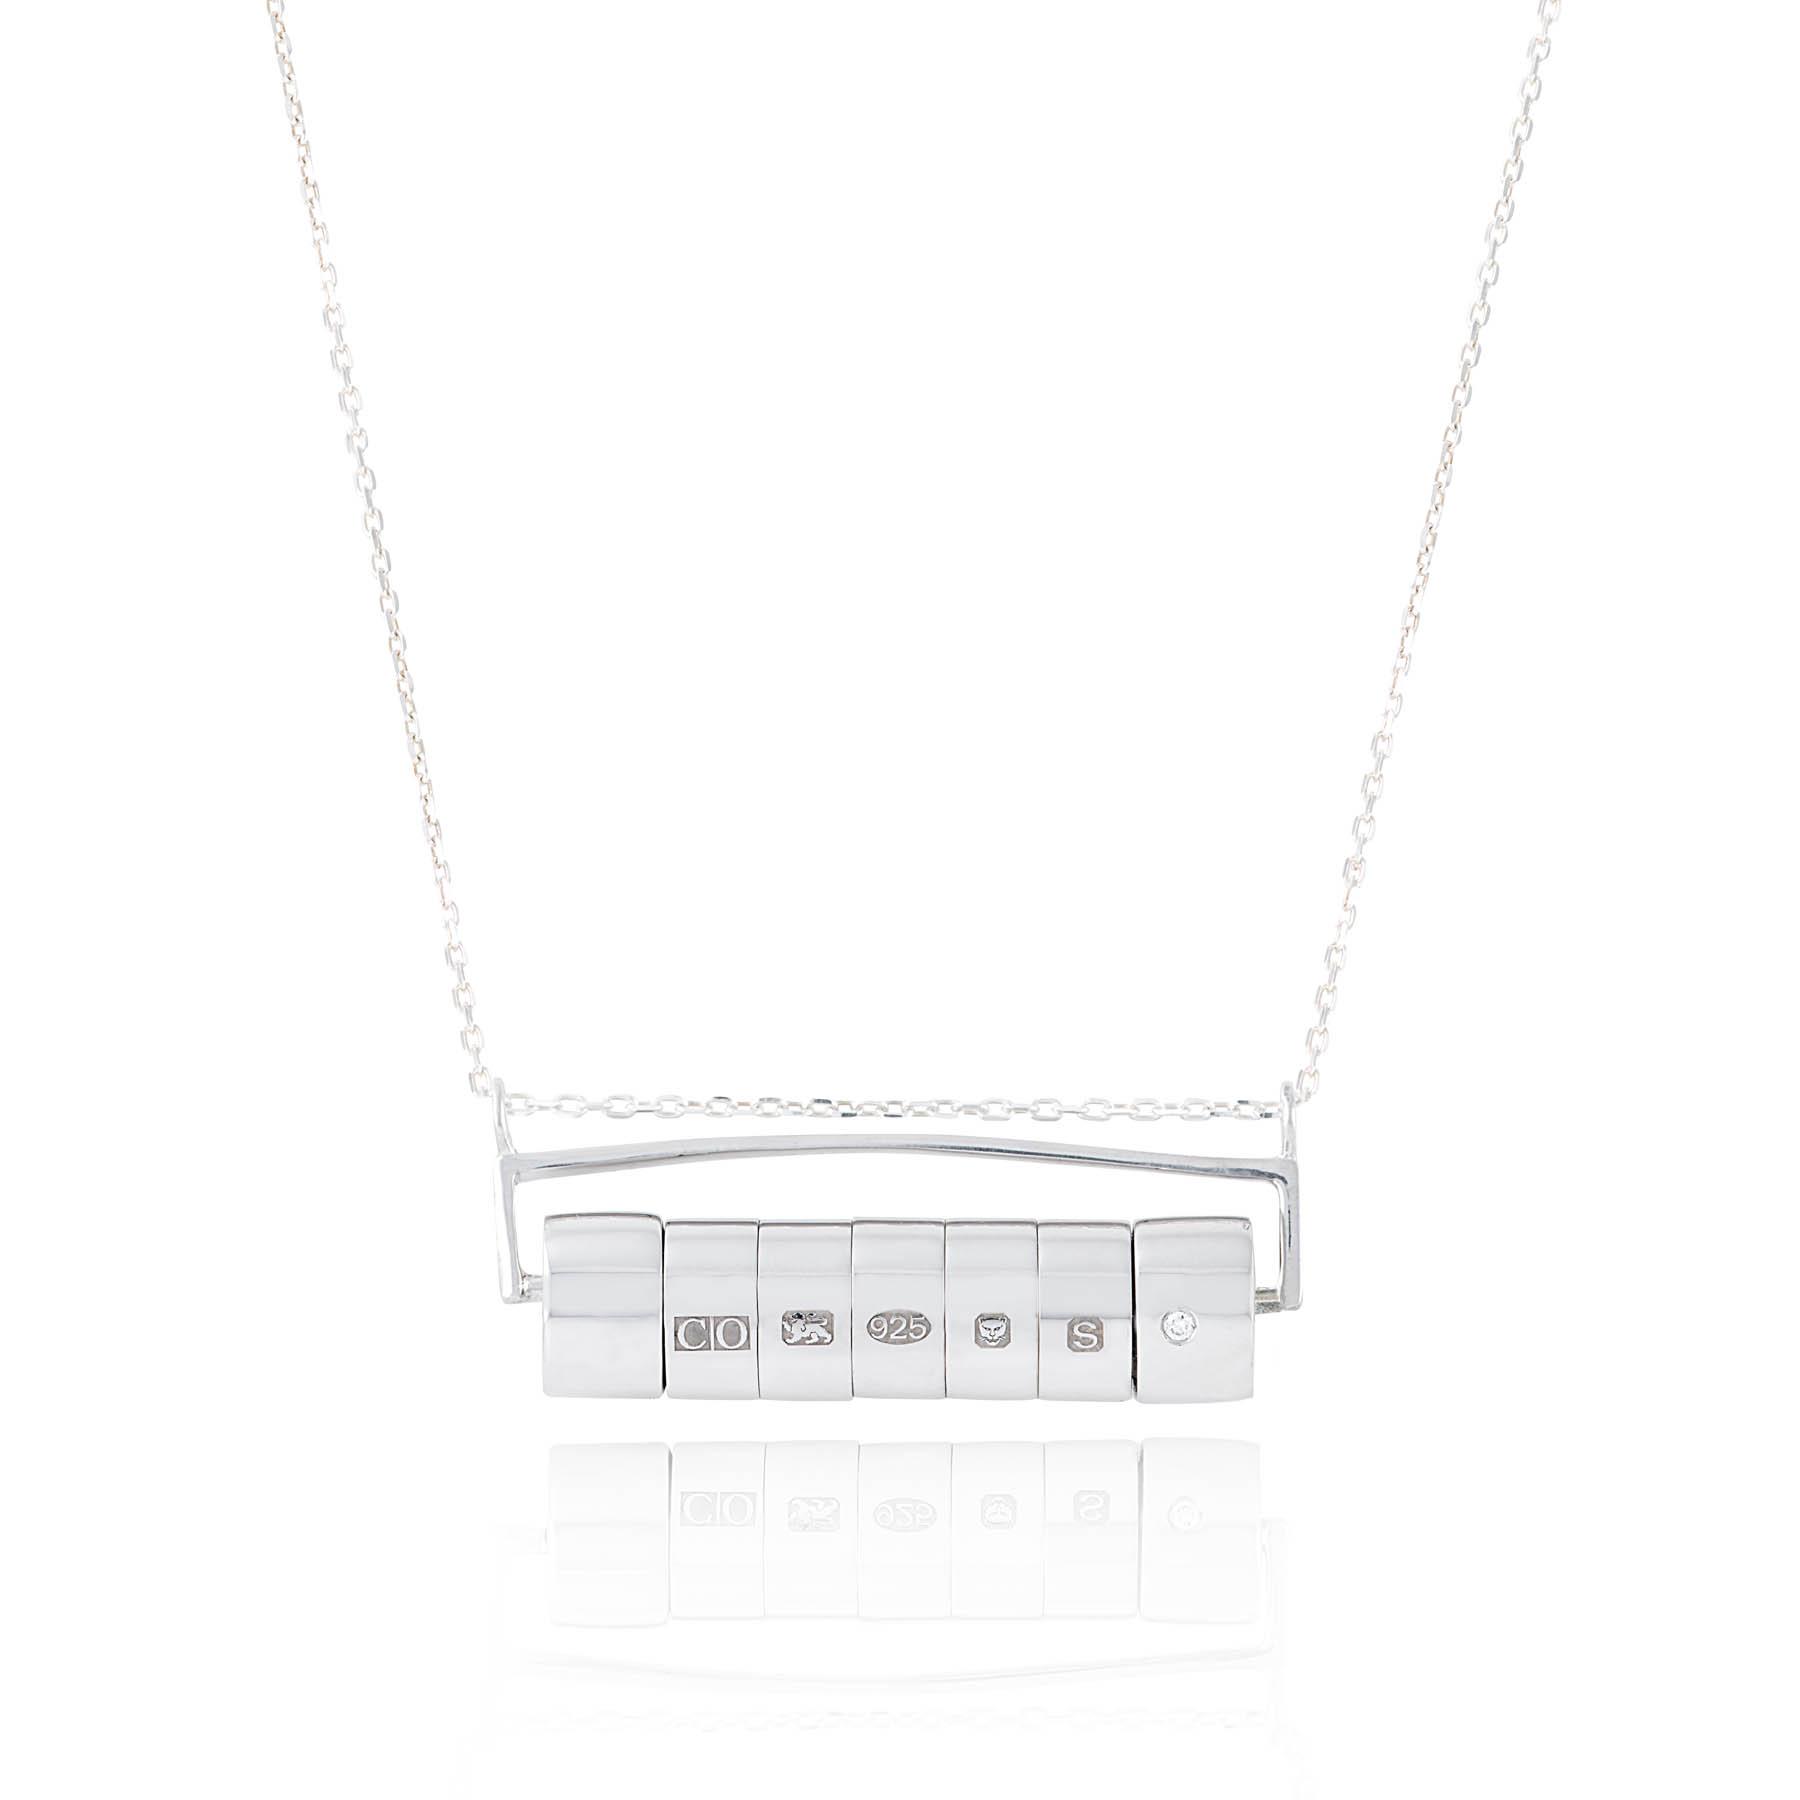 Charelle Smith, Unlock the Hallmark pendant/brooch